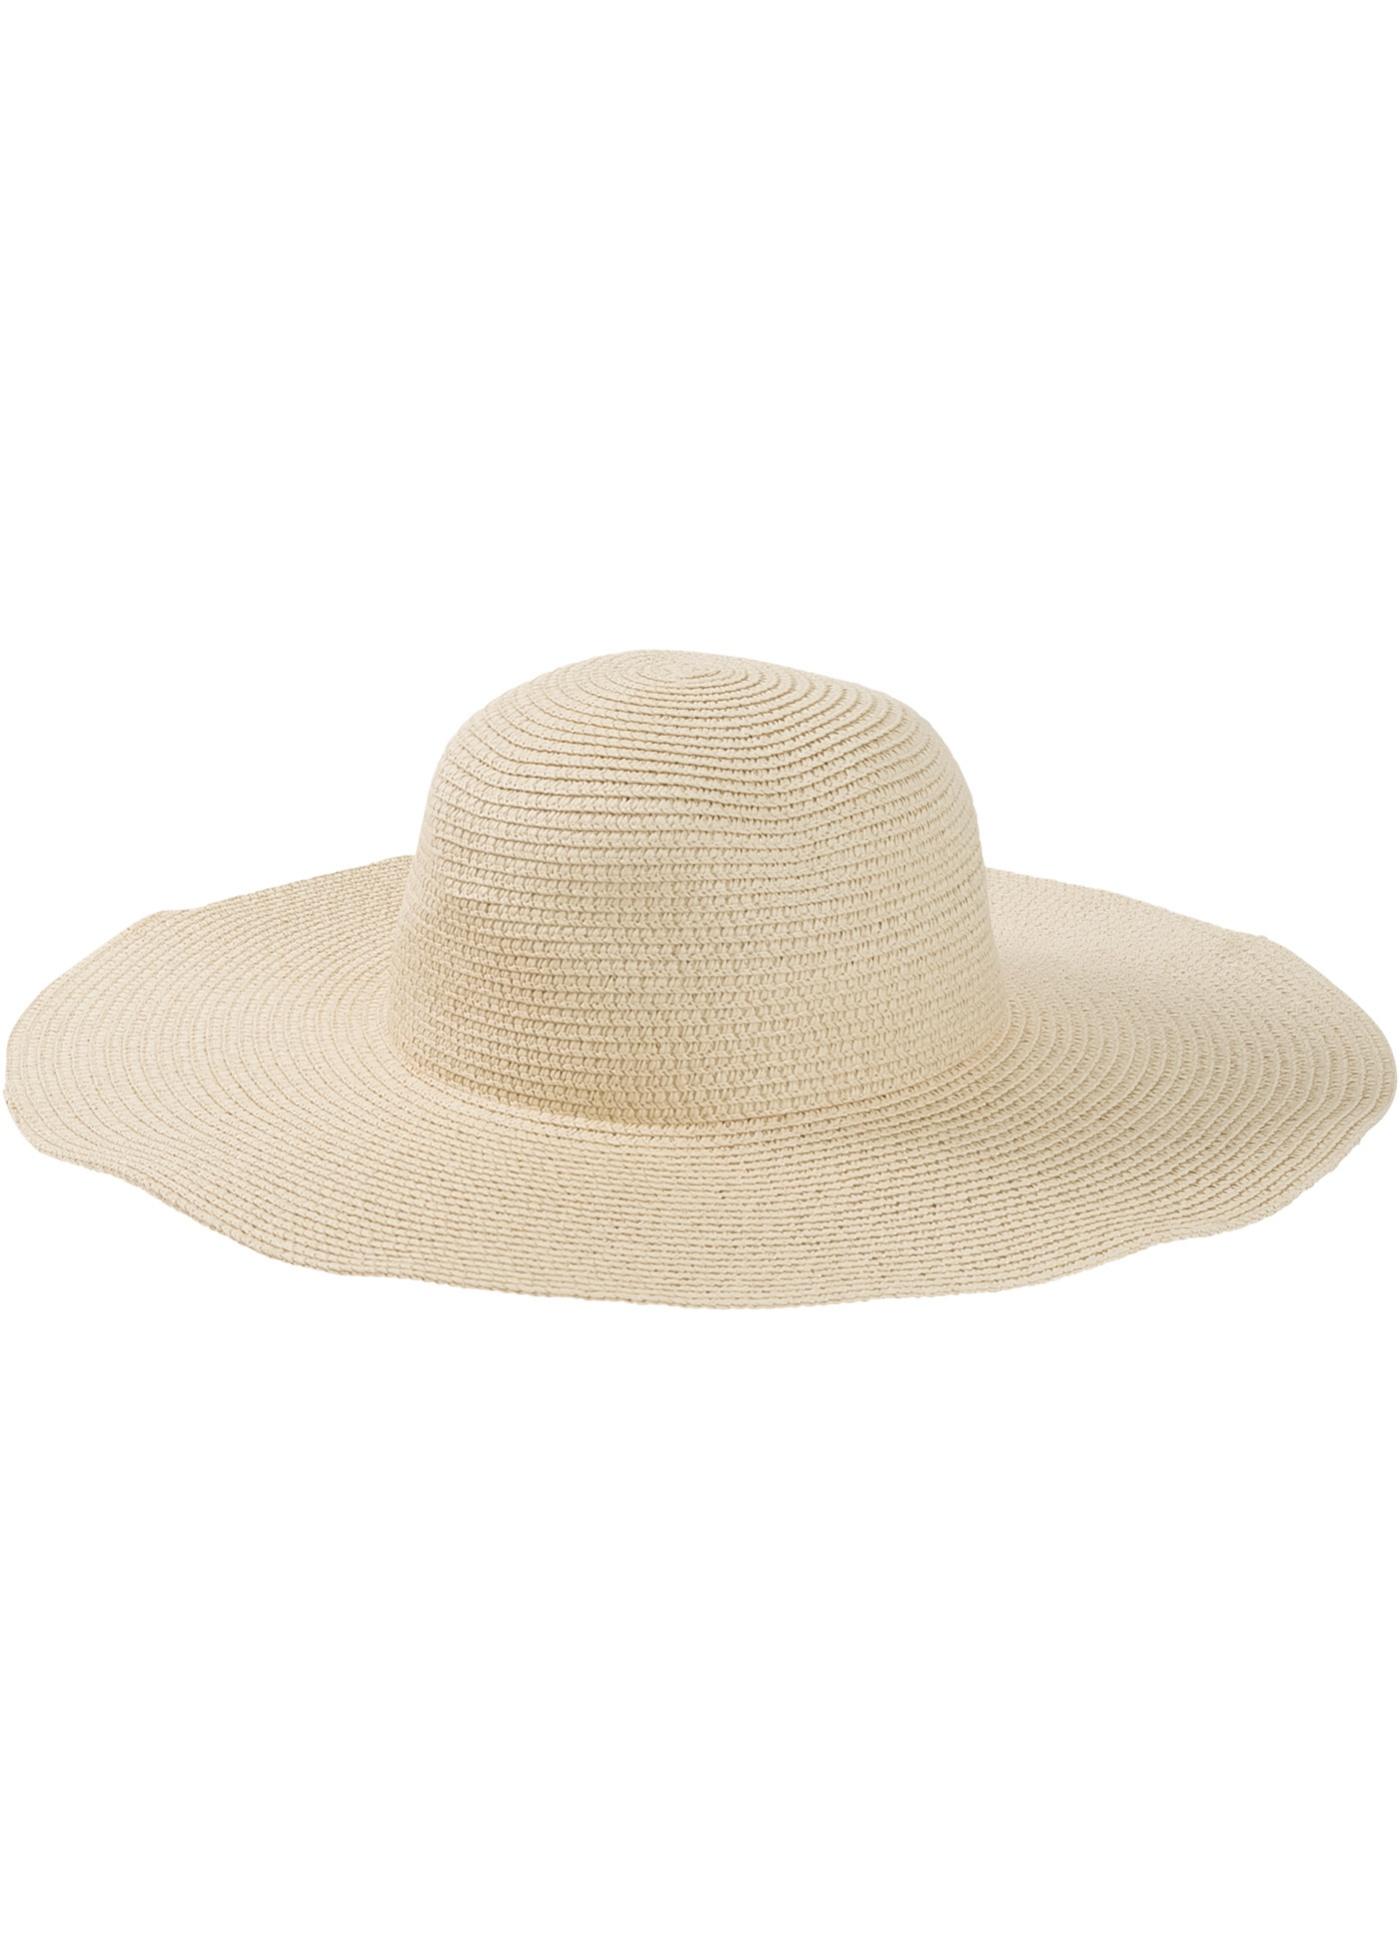 Moderni letni klobouk sedy levně  ed889a517e